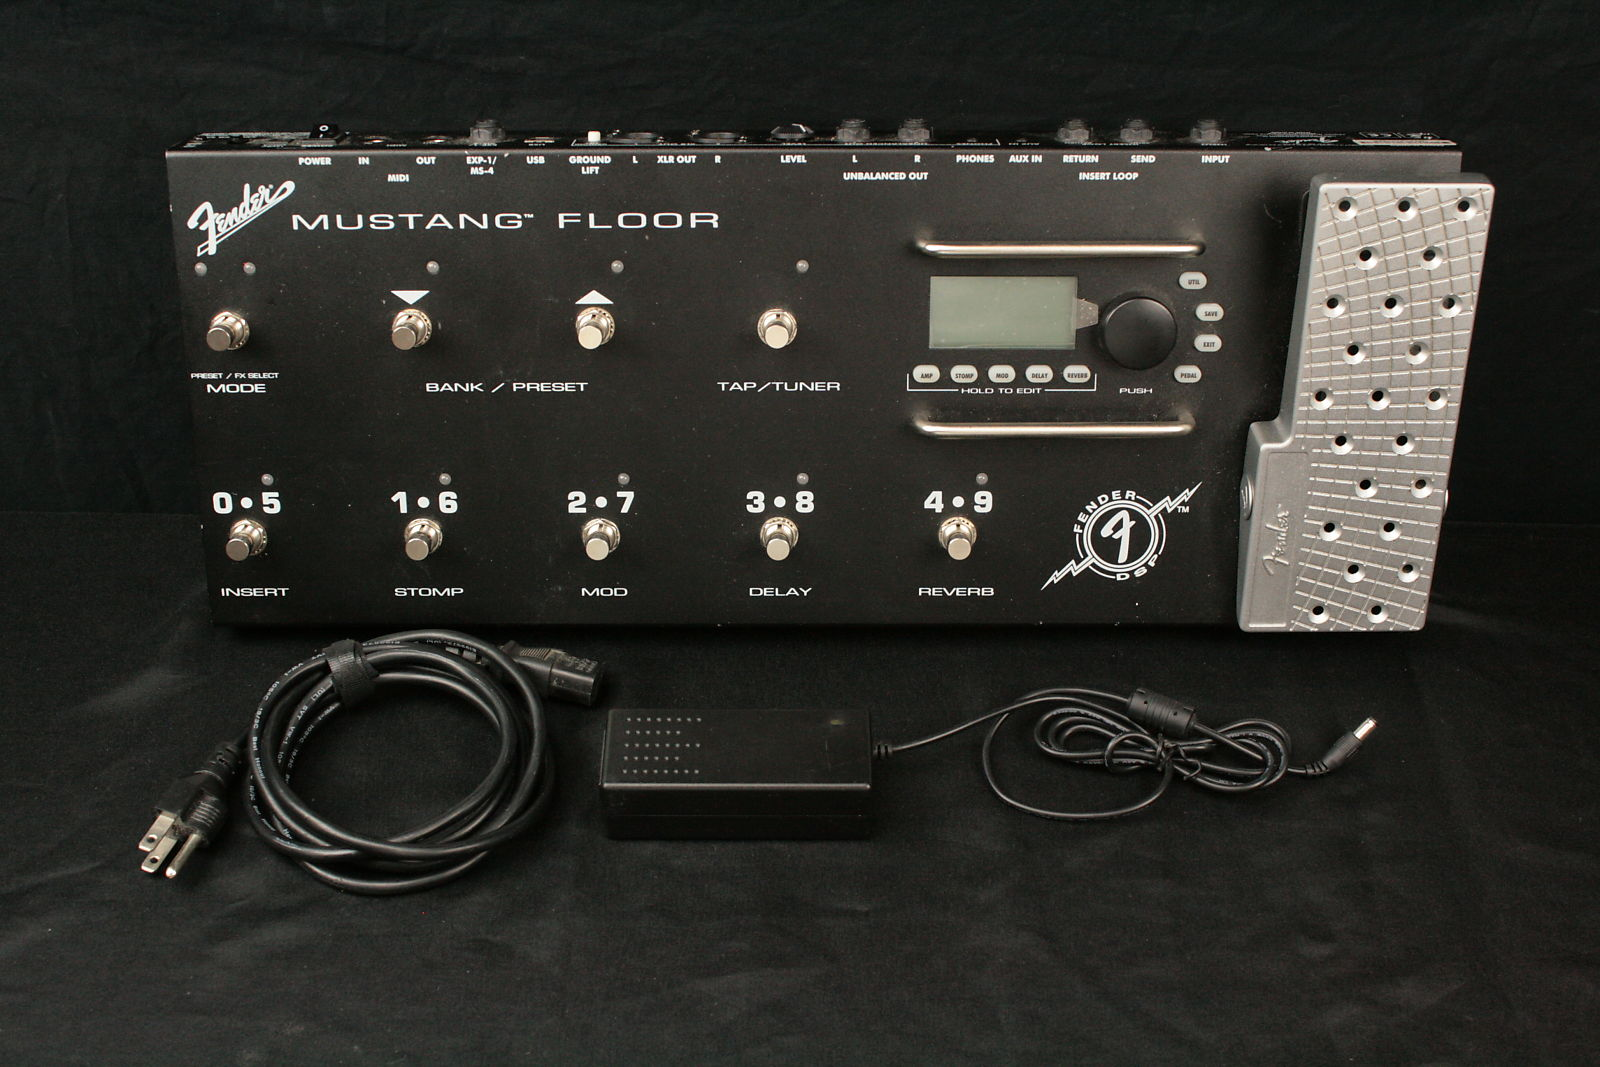 Fender Mustang Floor Multi-effects